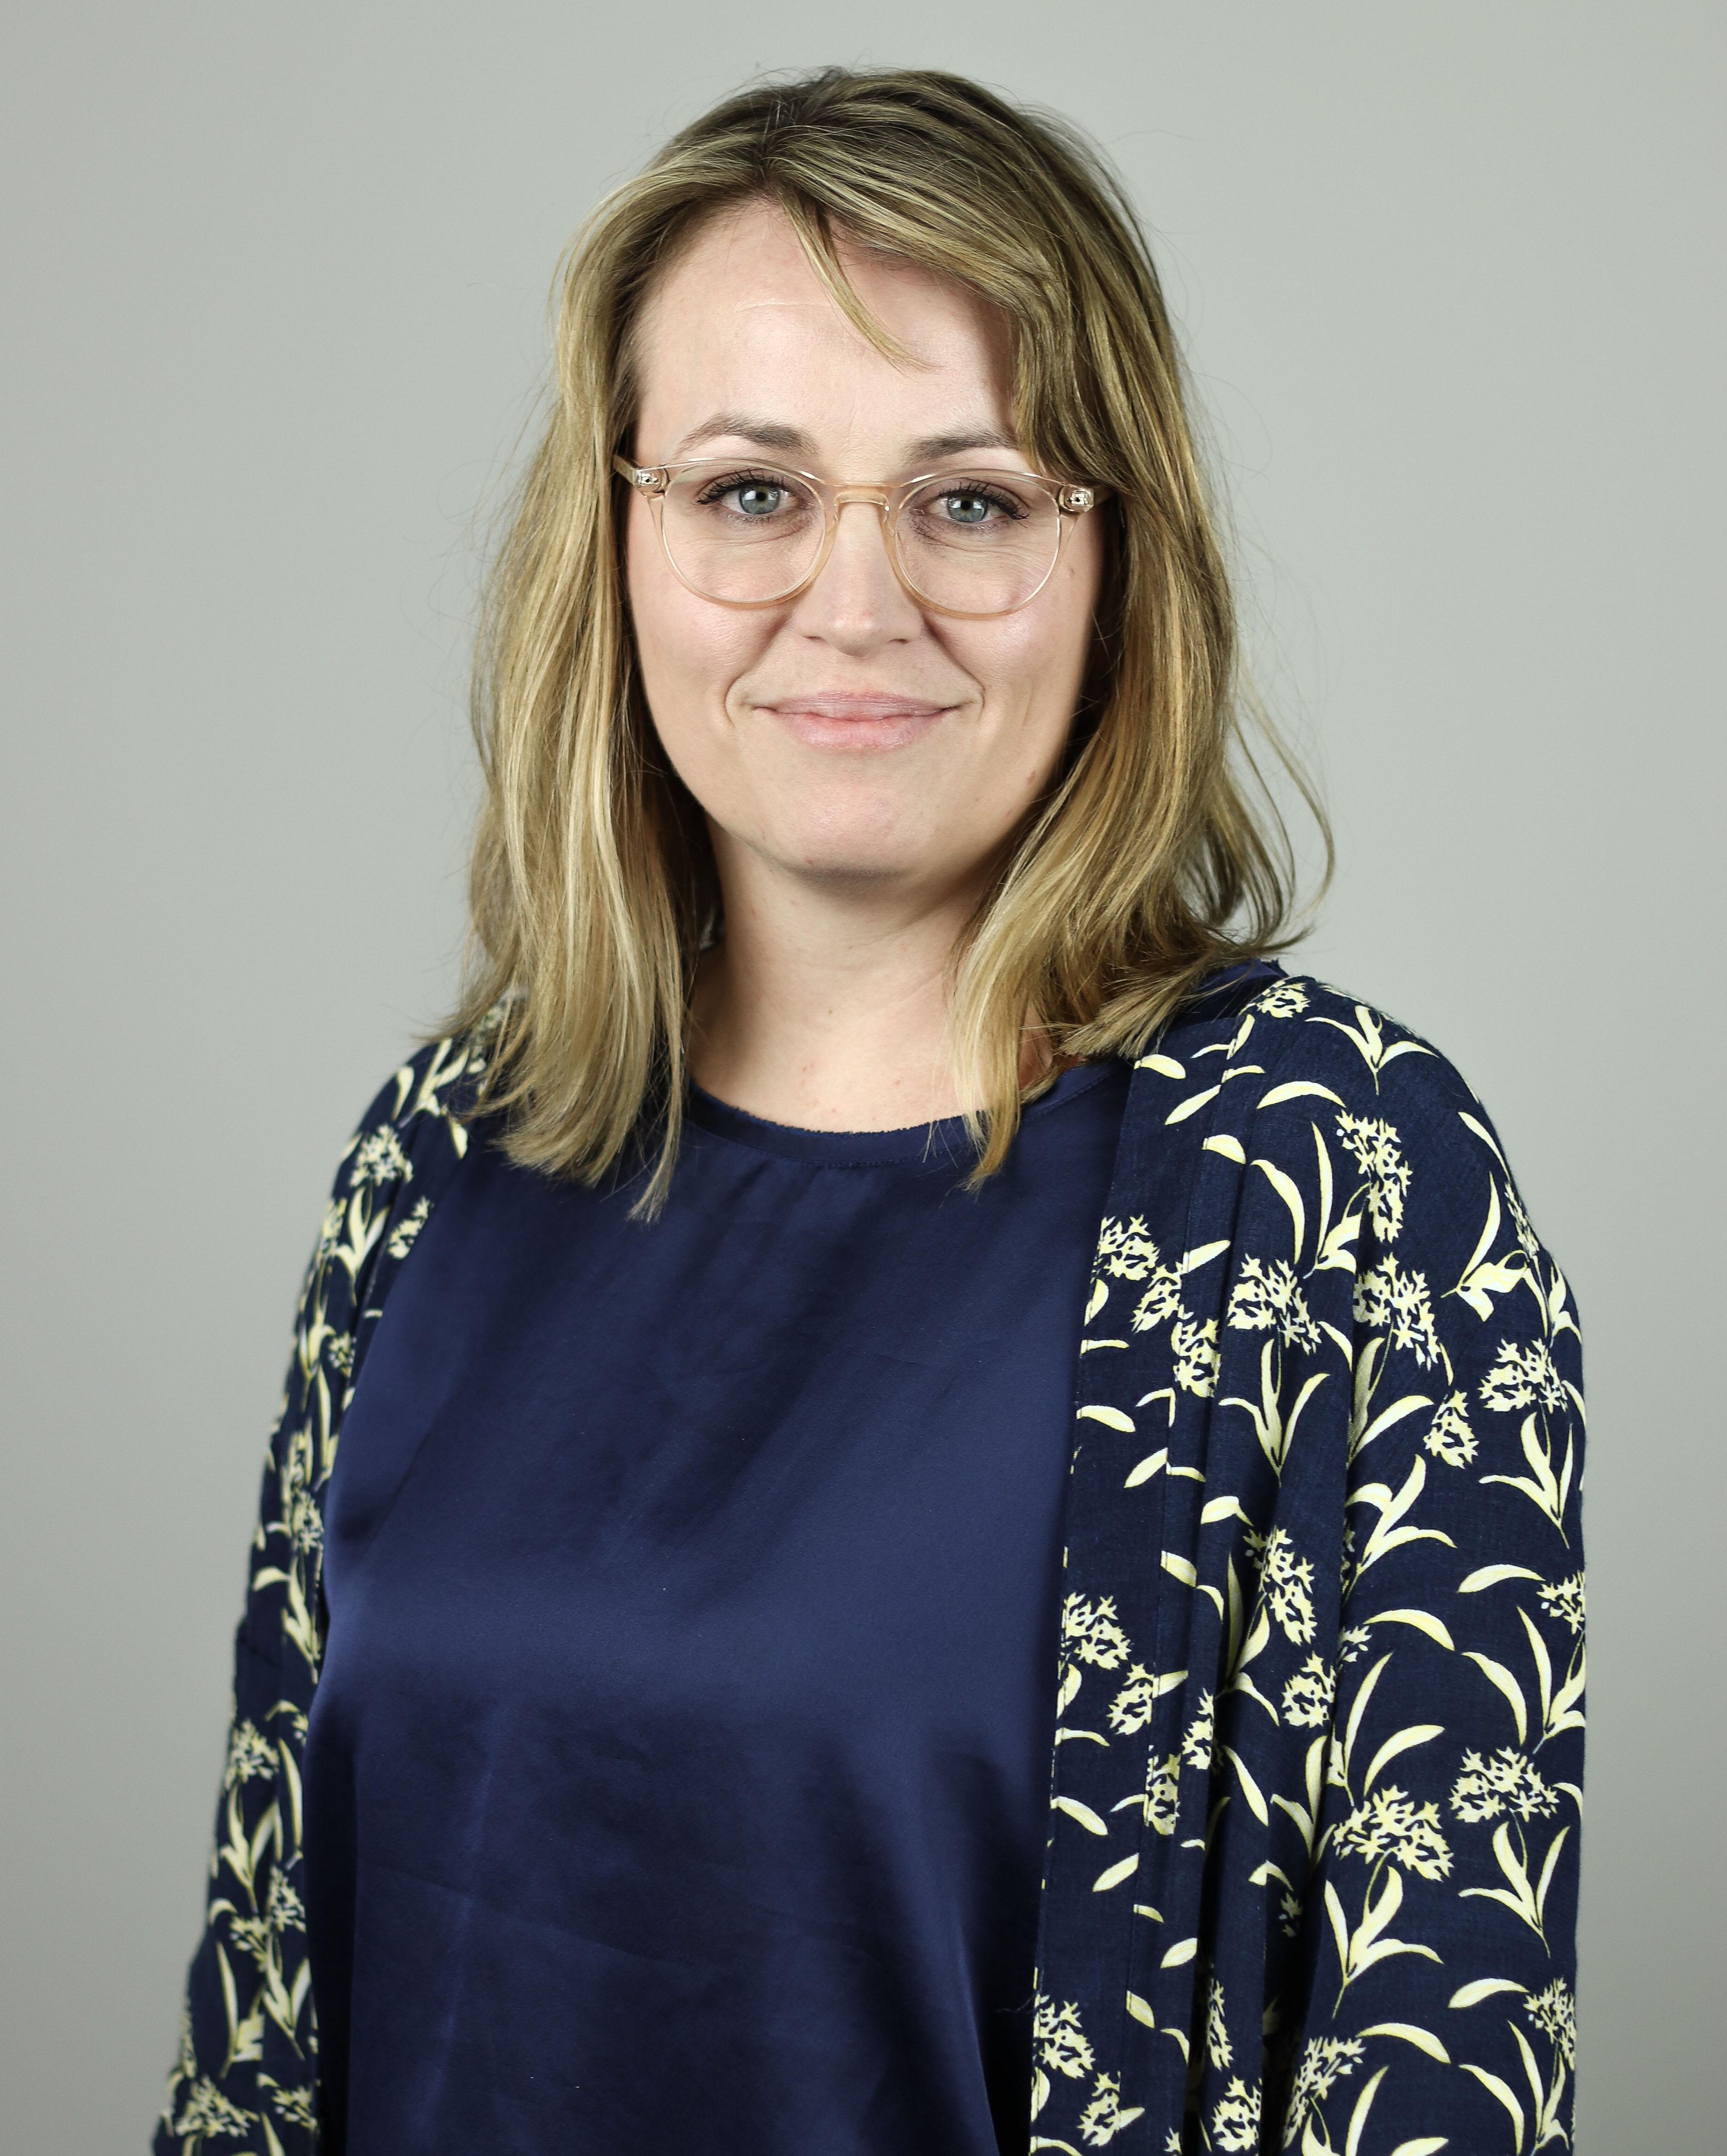 Anne Christine Bisgaard Eggert